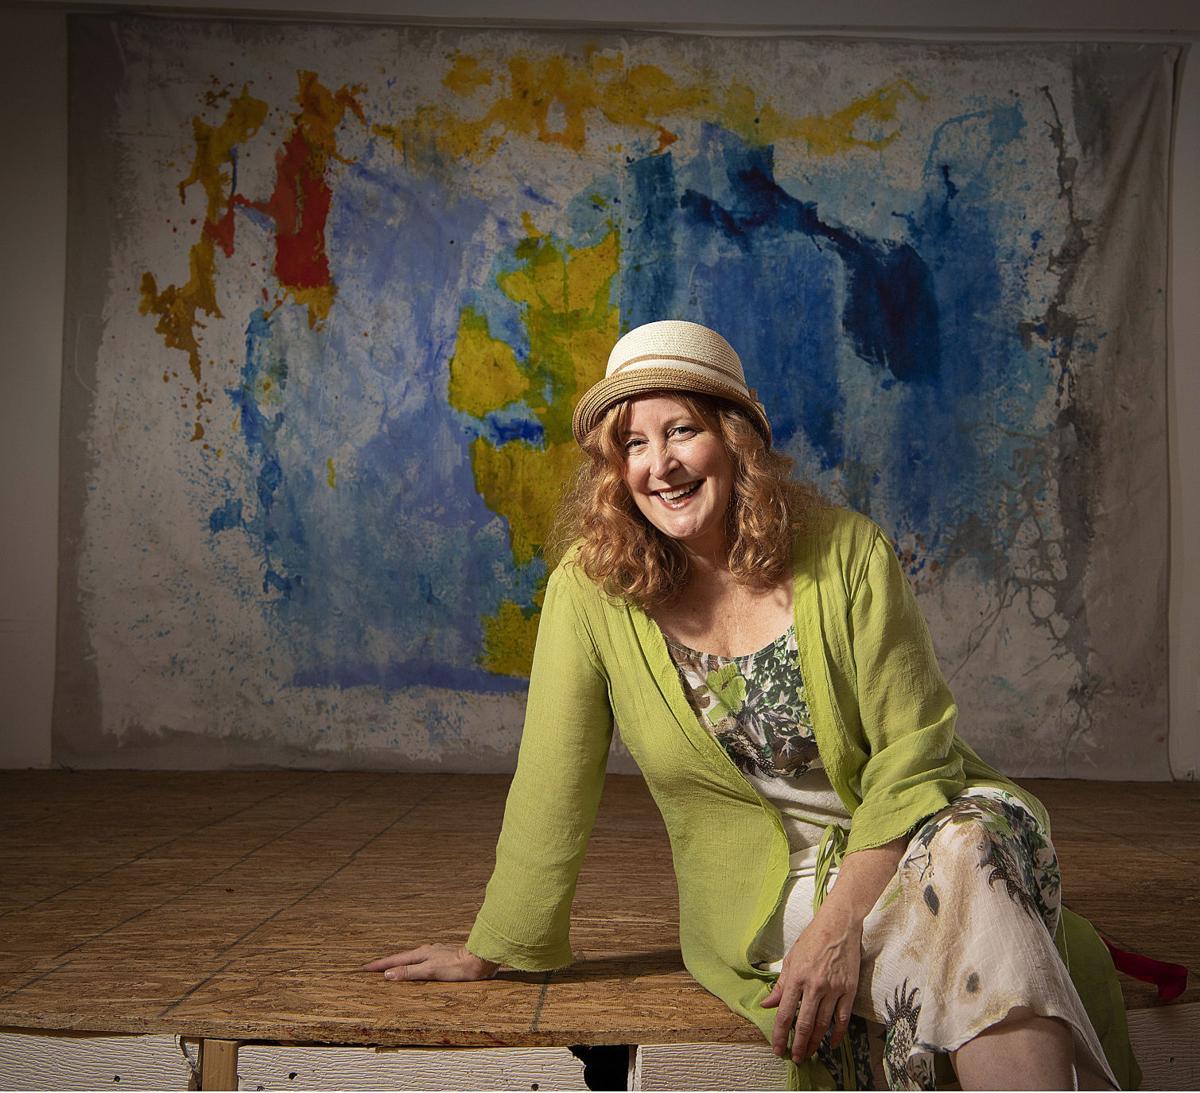 Christine Mosere